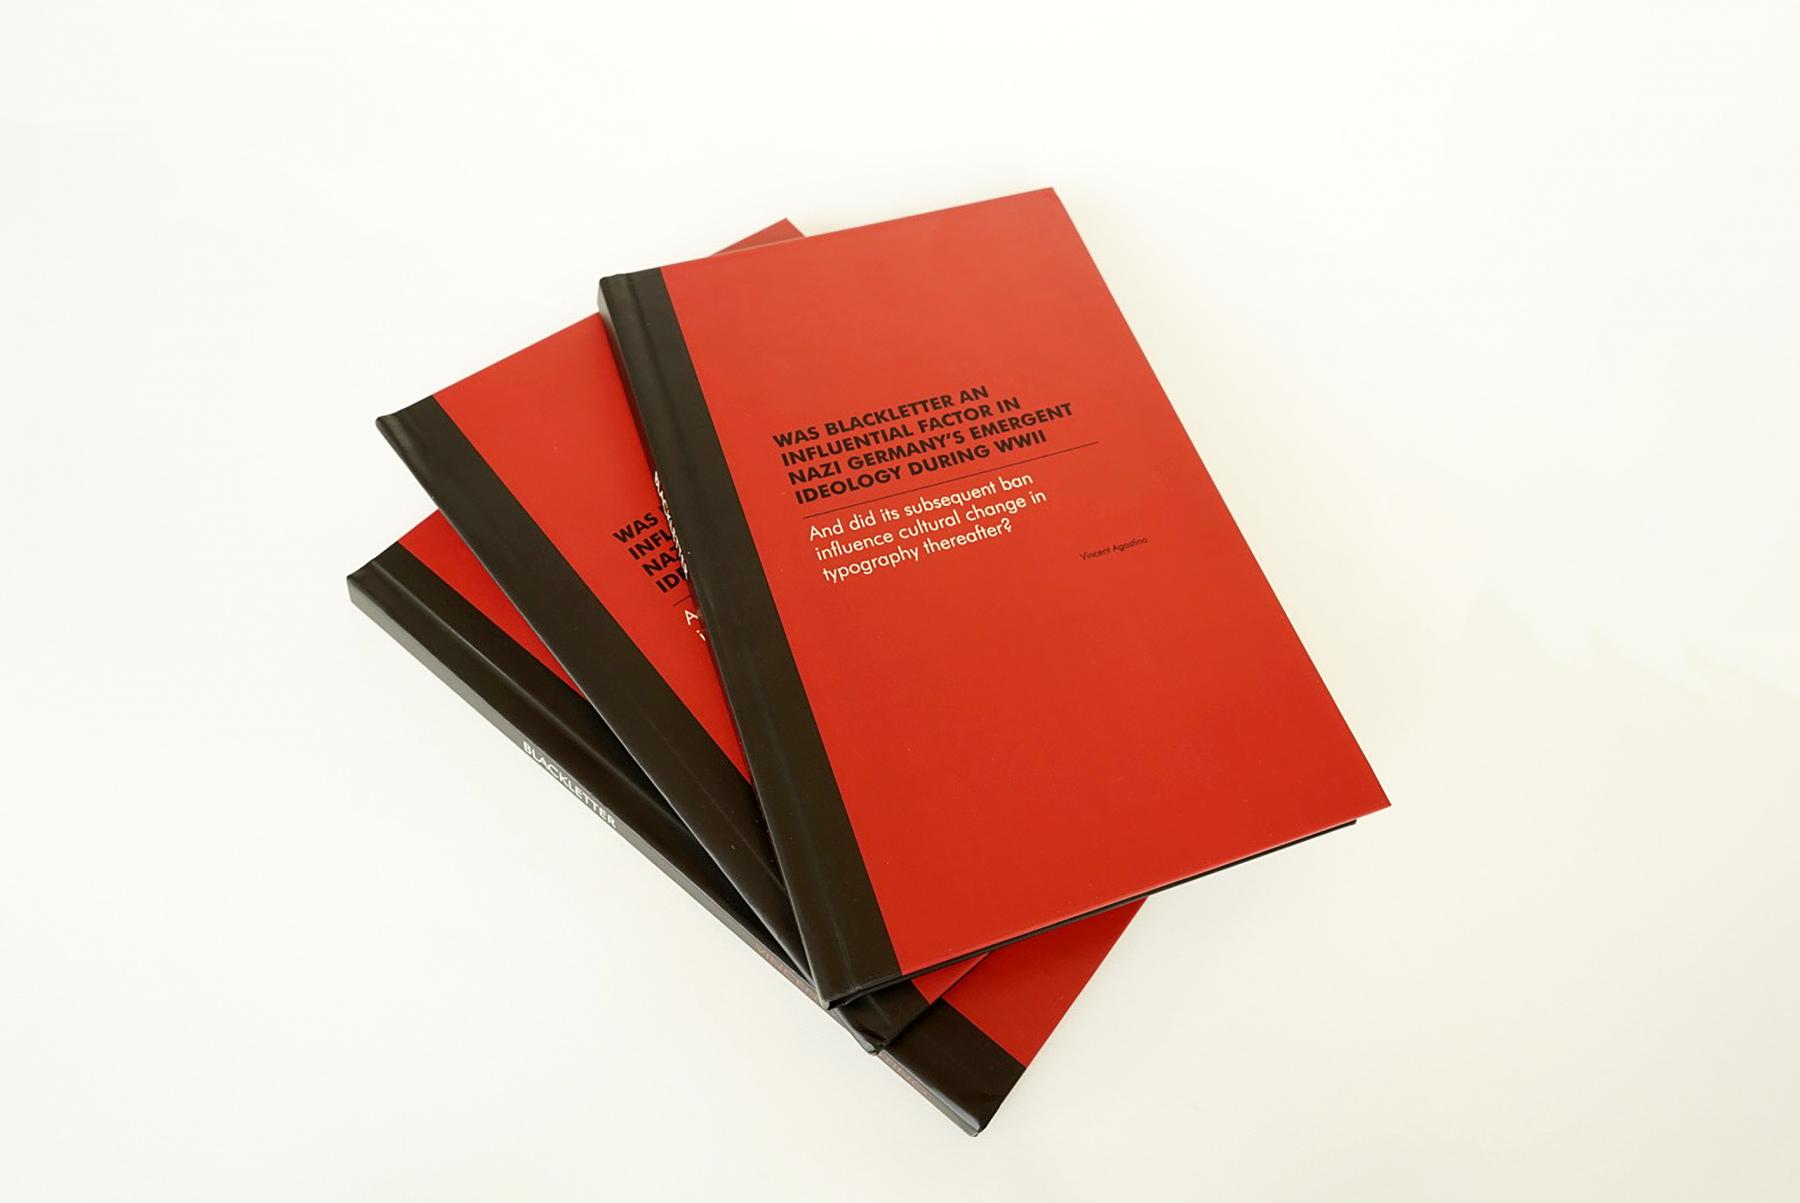 product design dissertation